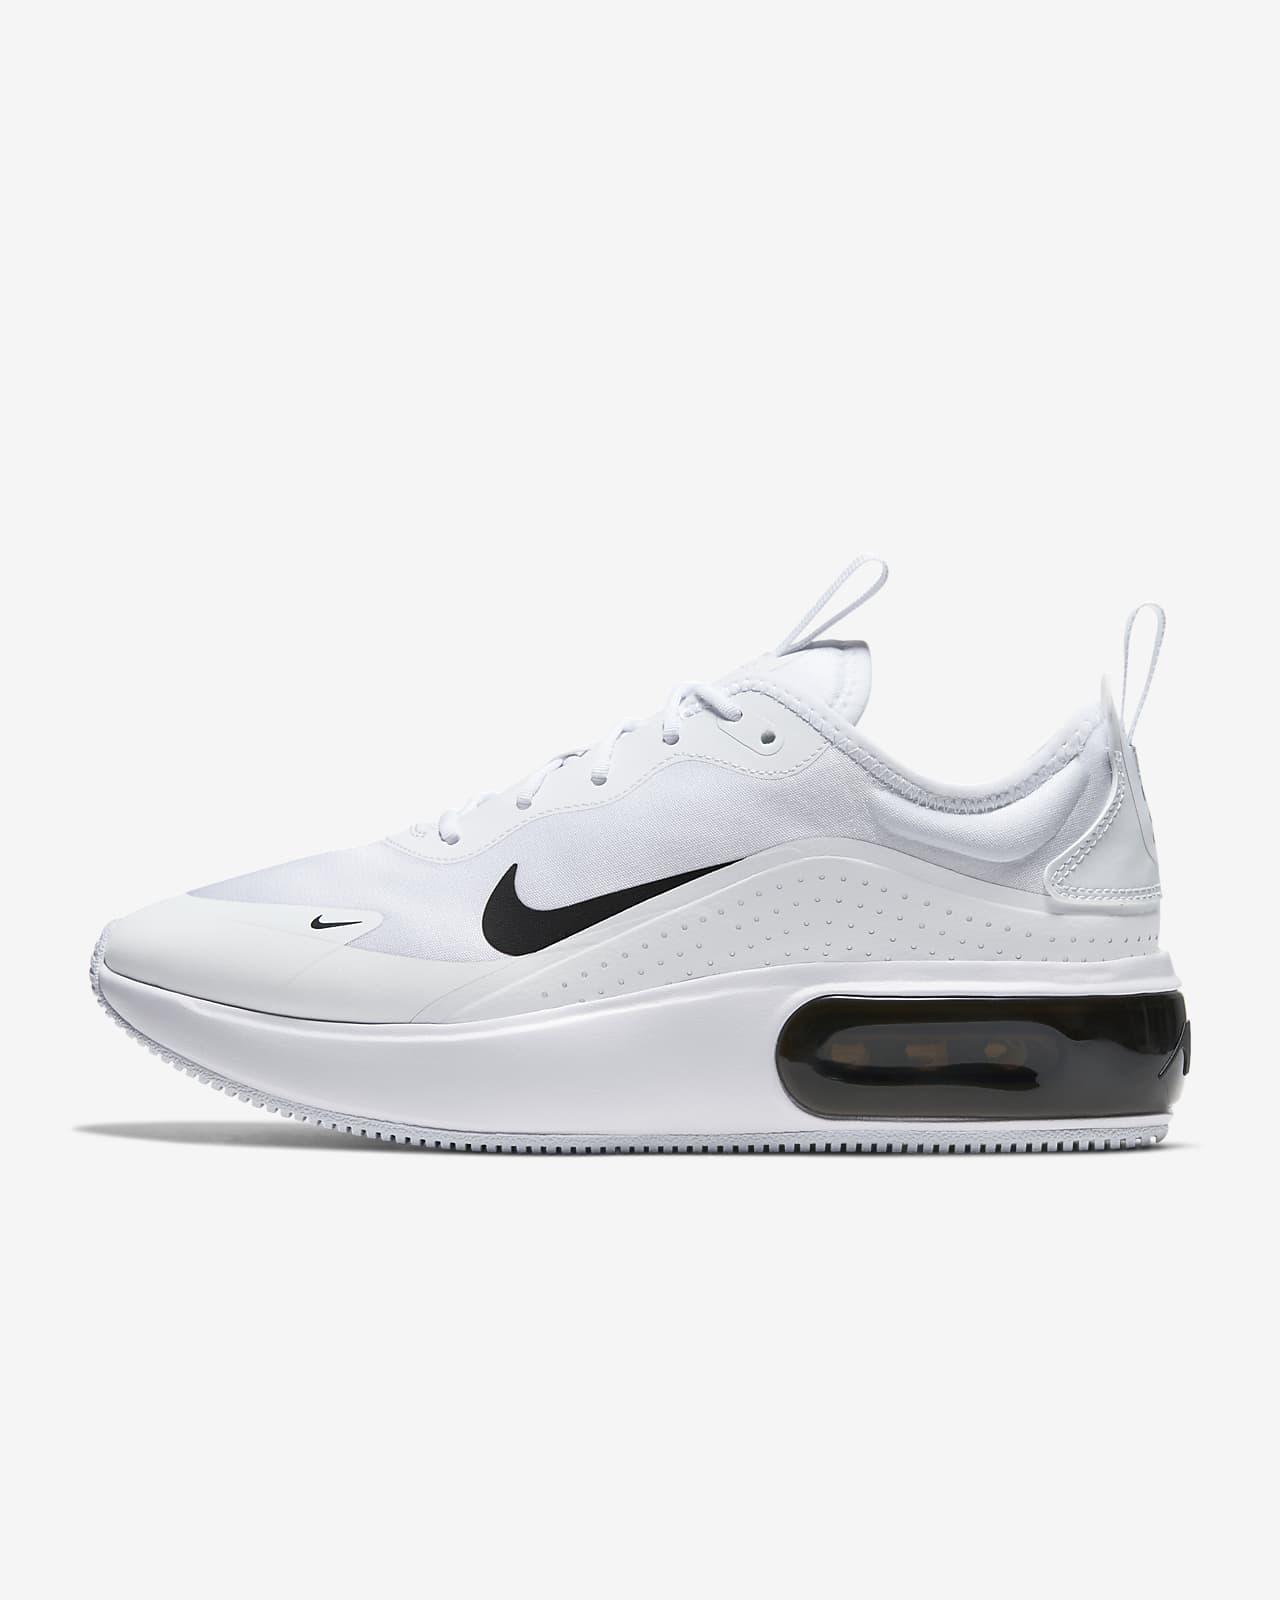 Nike Air Max Dia Damenschuh